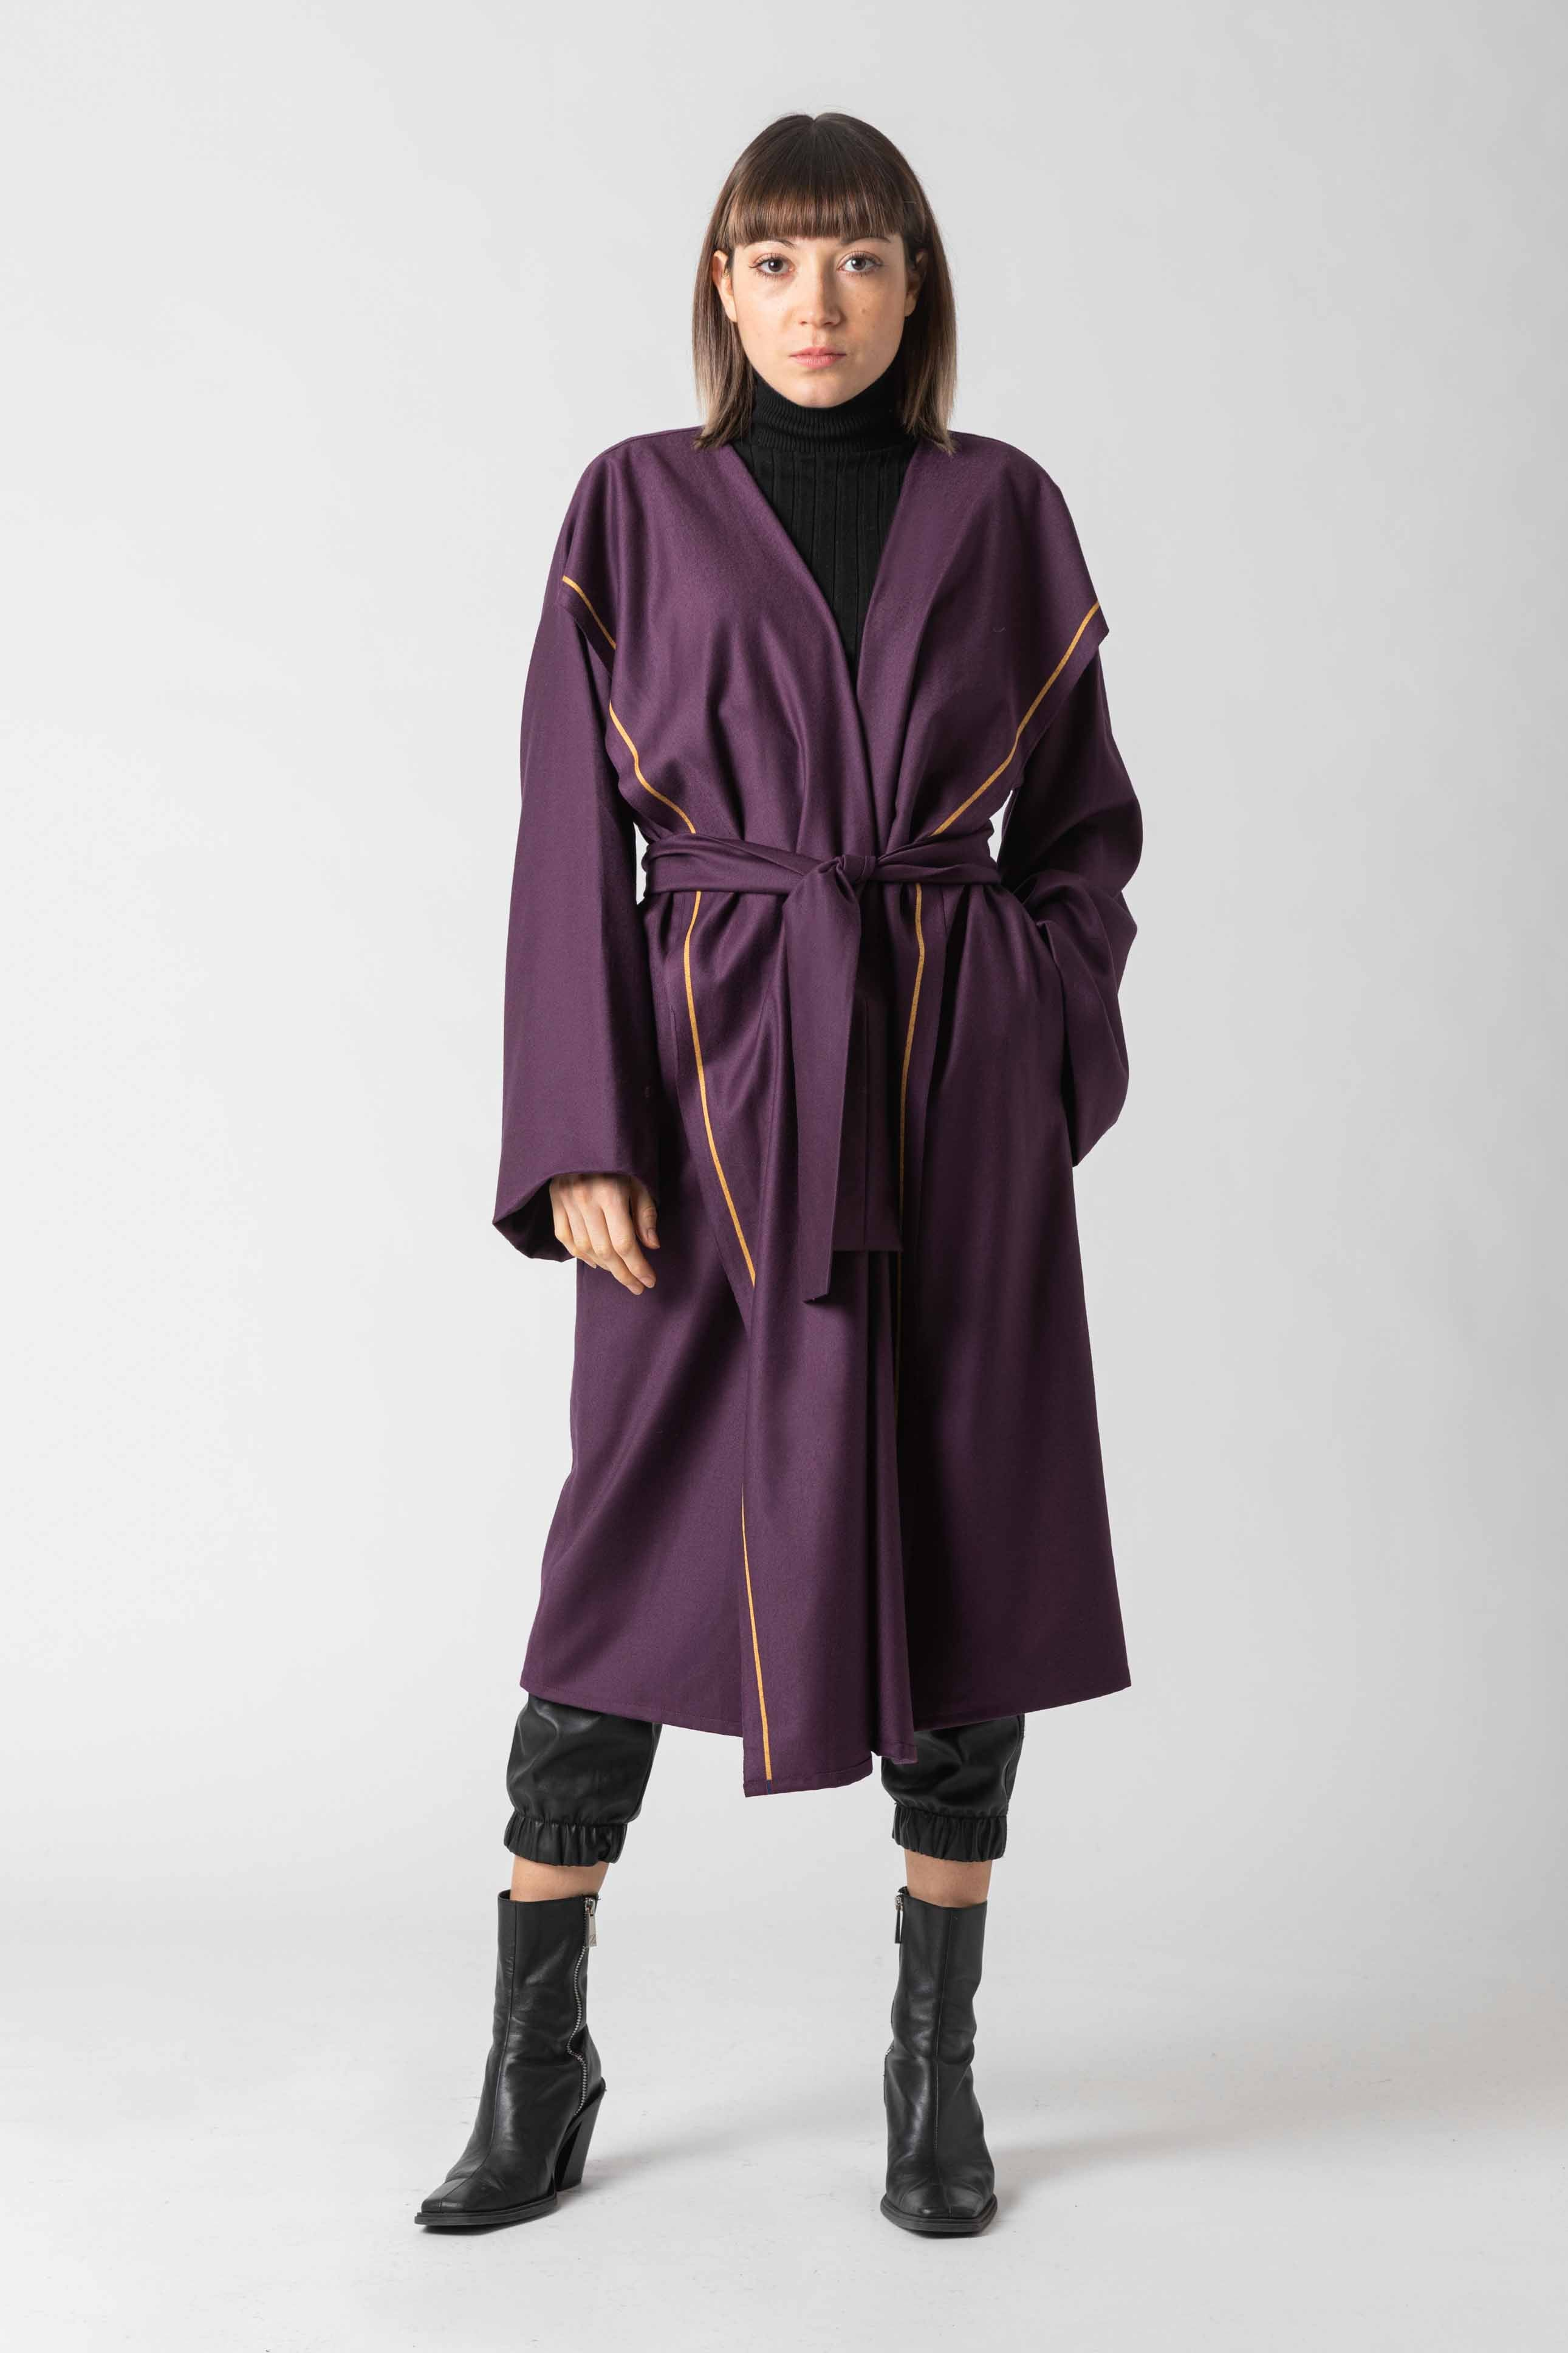 CLARICE - Purple